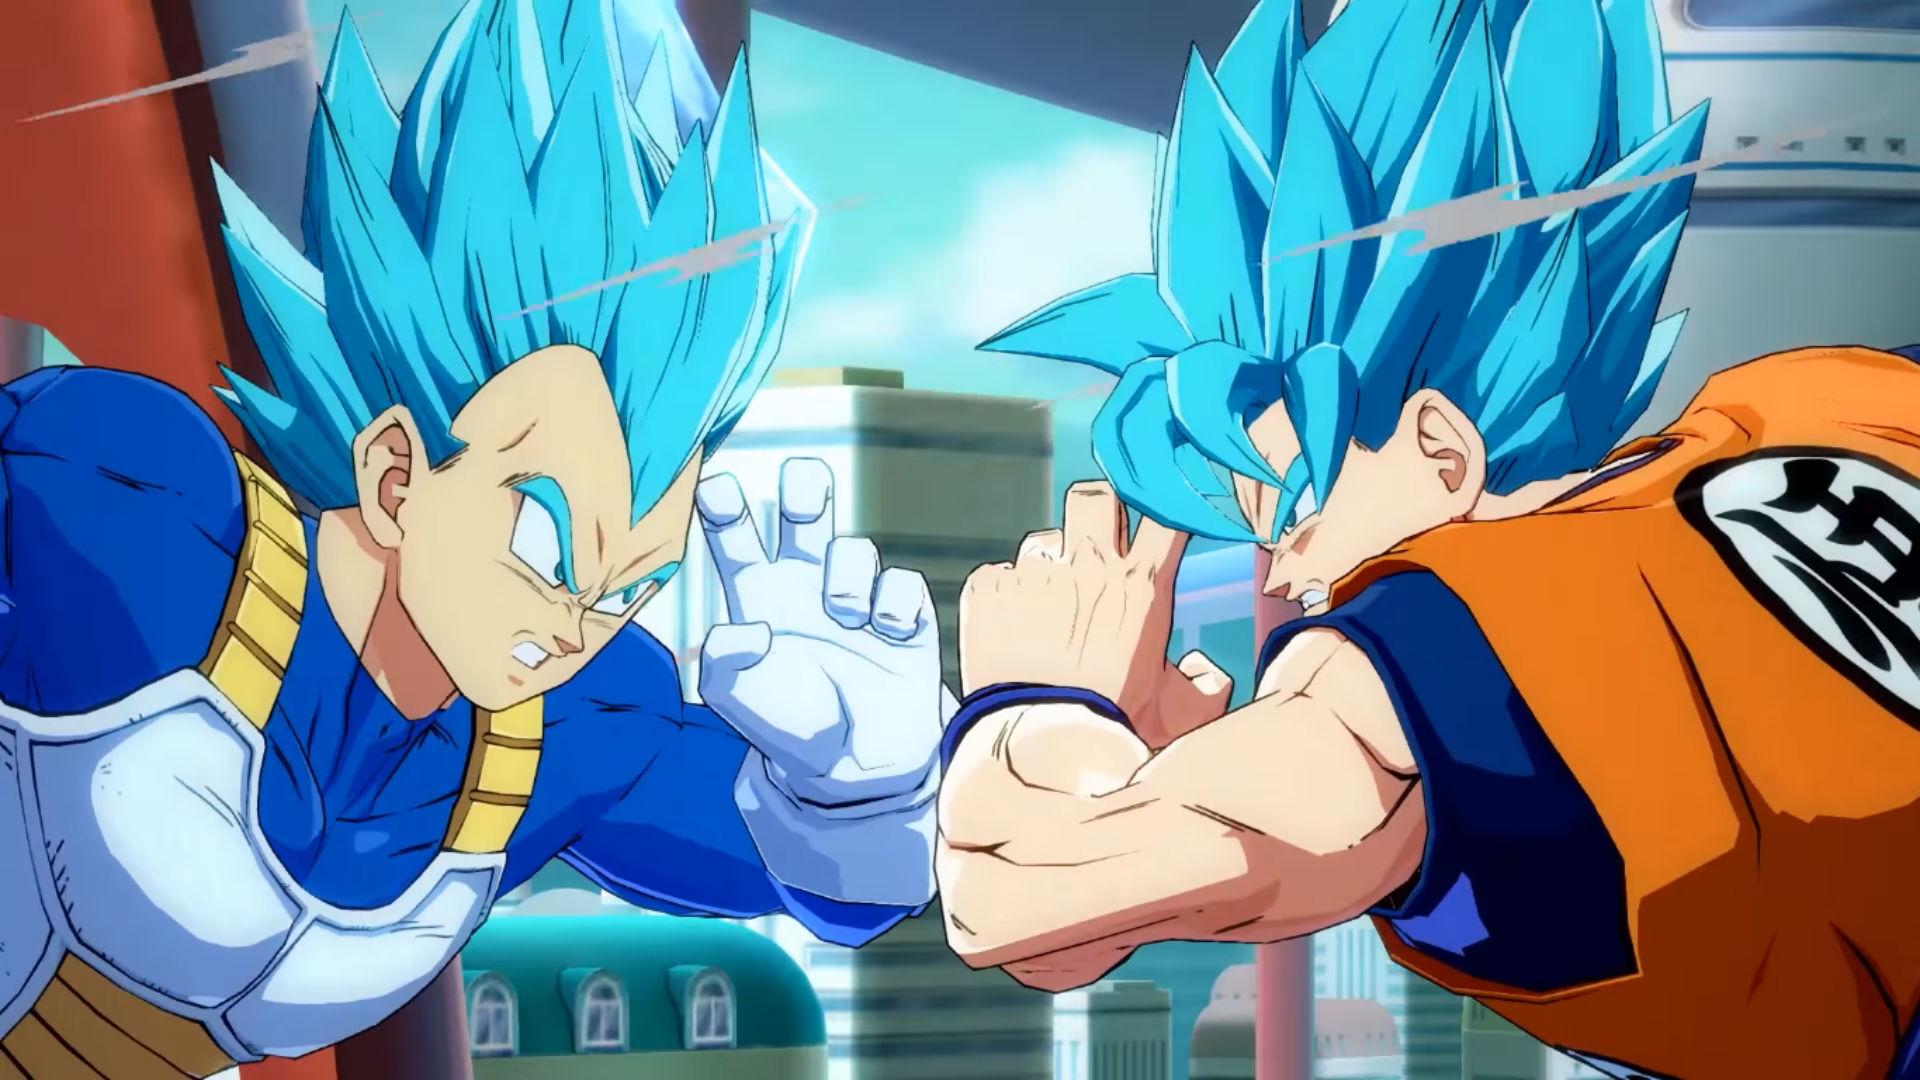 Watch Super Saiyan Blue Goku and Vegeta tear it up in Dragon Ball FighterZ screenshot